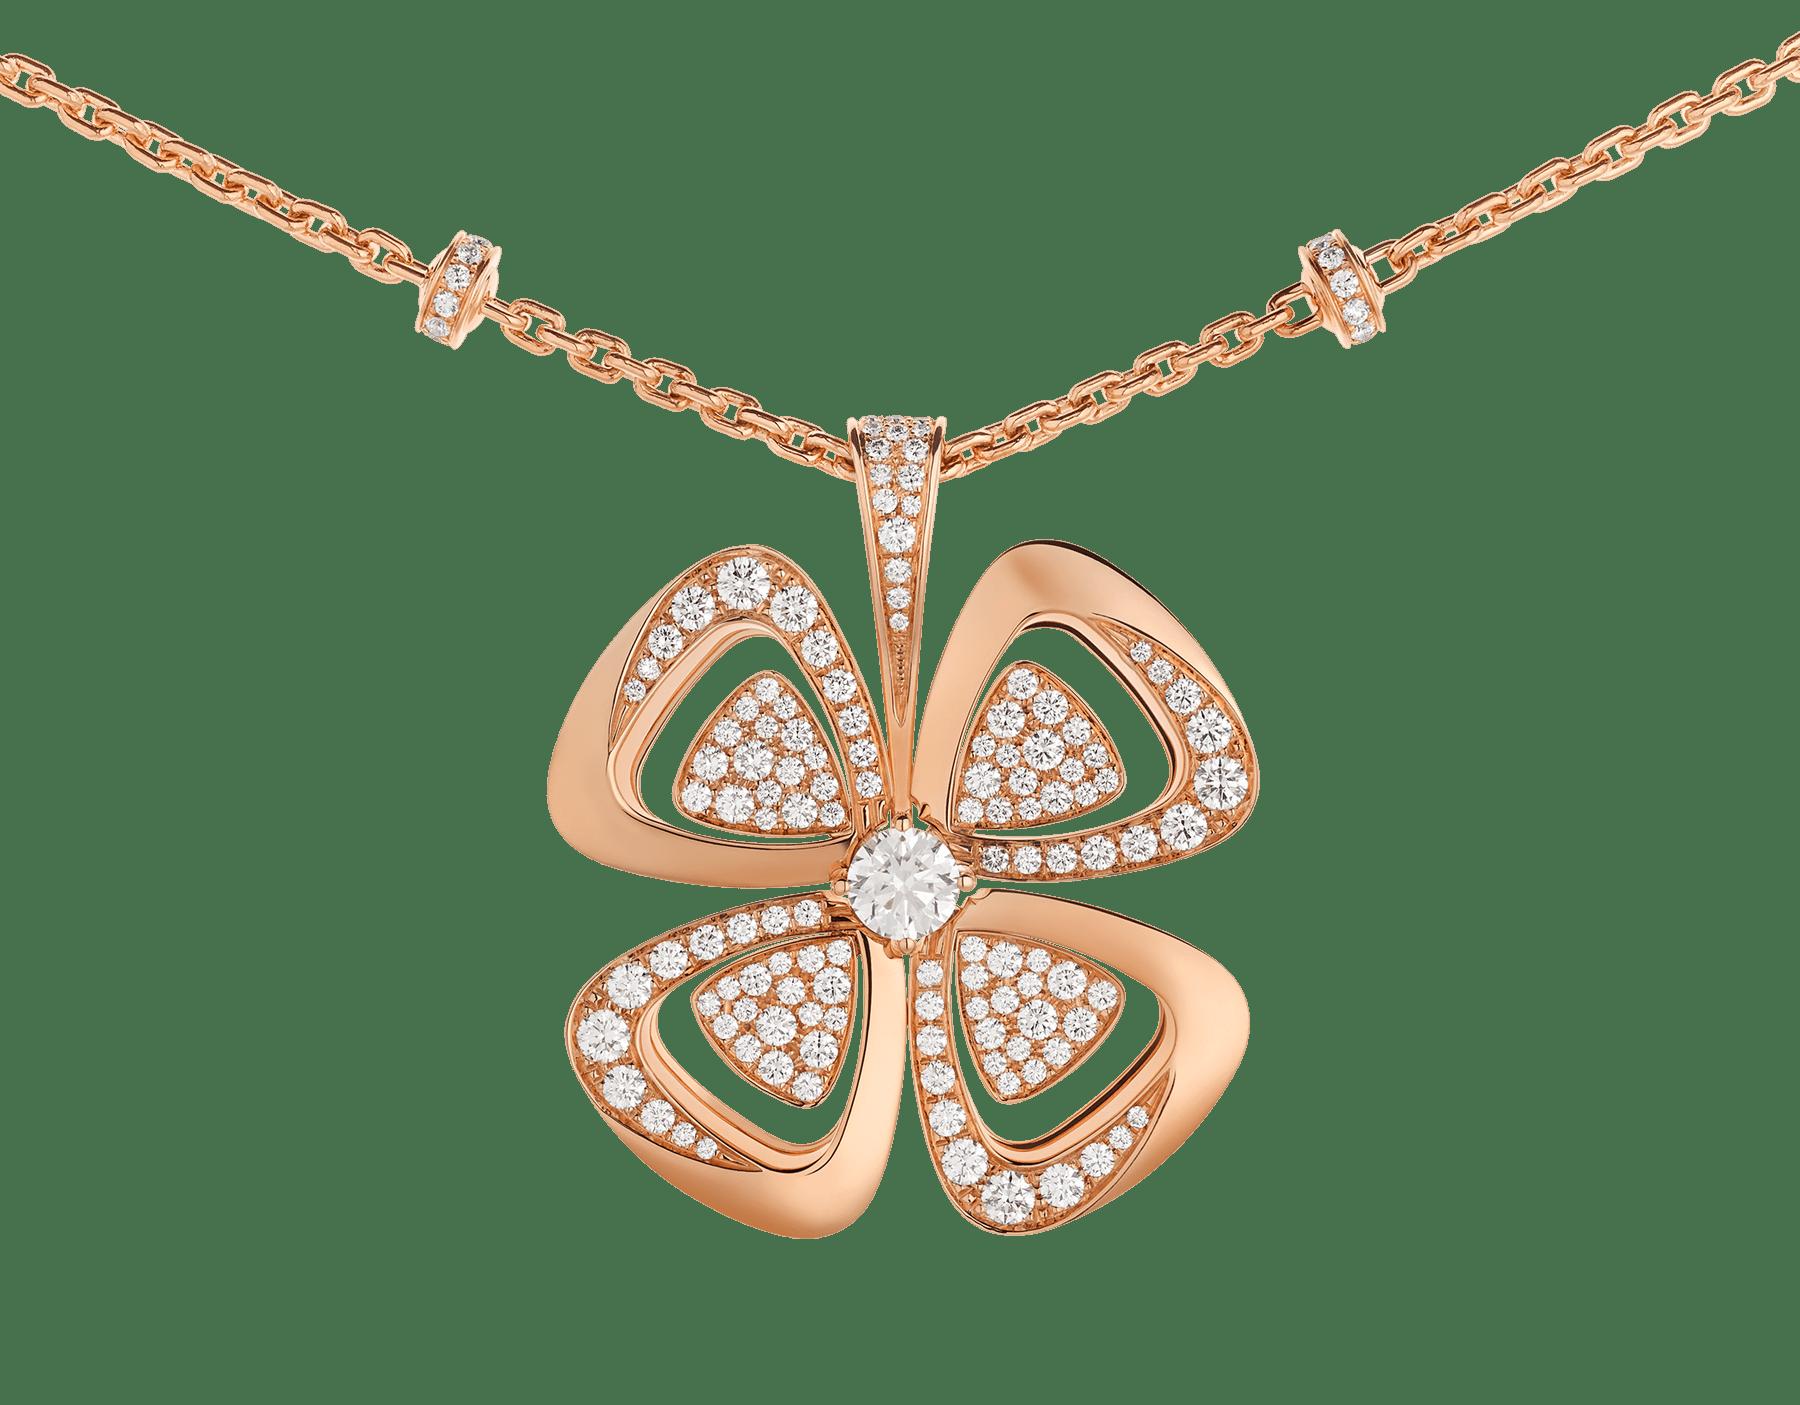 Collar Fiorever en oro rosa de 18qt con un diamante central redondo talla brillante y pavé de diamantes. 357218 image 3